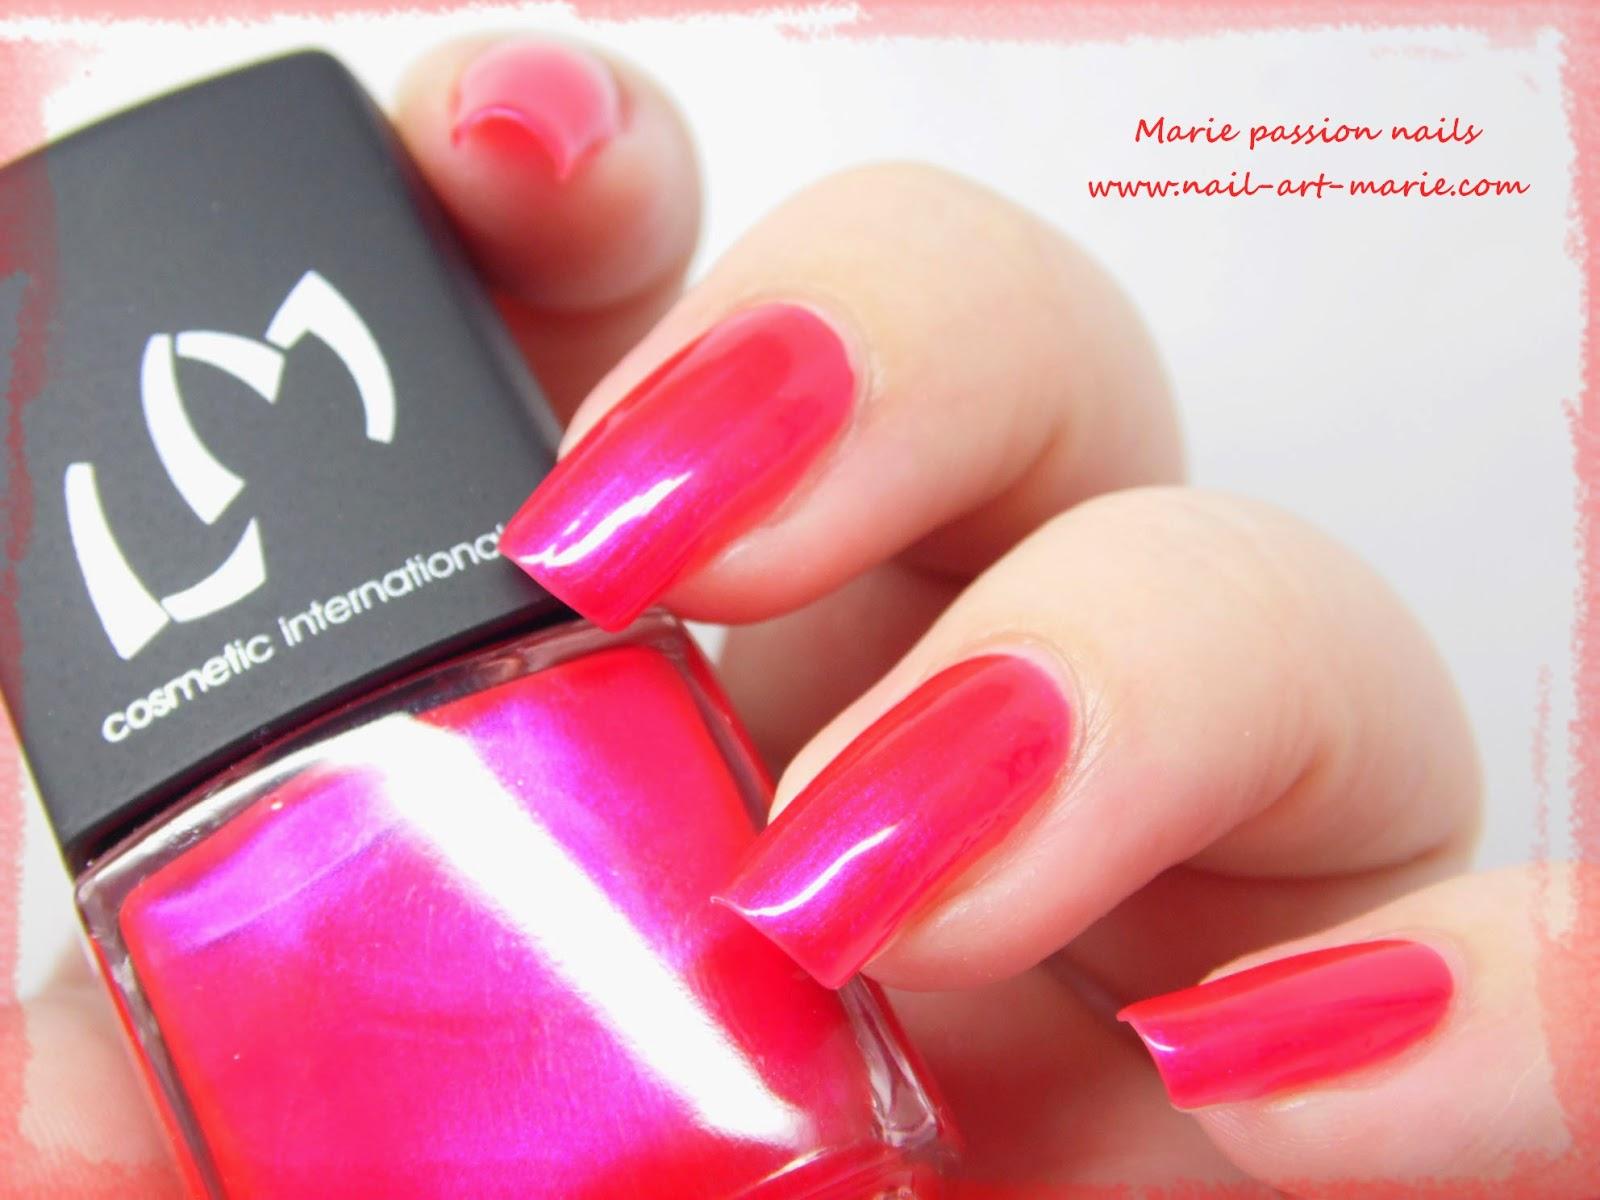 LM Cosmetic Maracana6